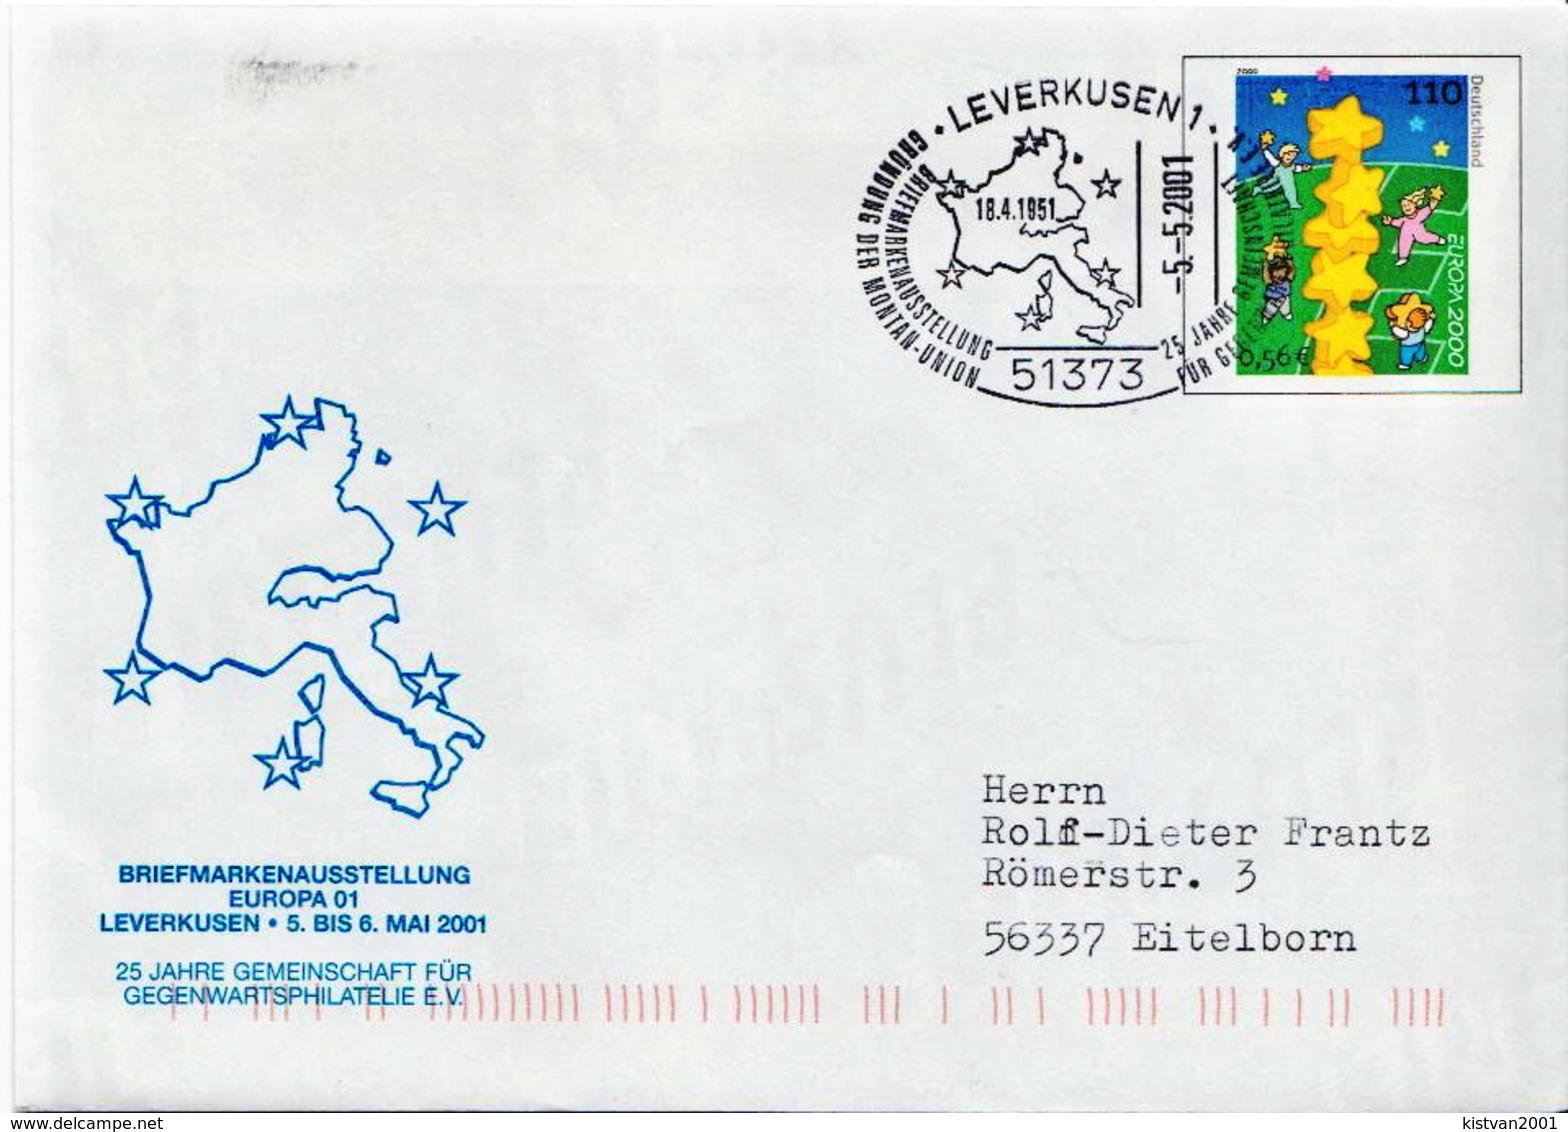 Postal History: Germany Postal Stationery Cover, Leverkusen - Europa-CEPT